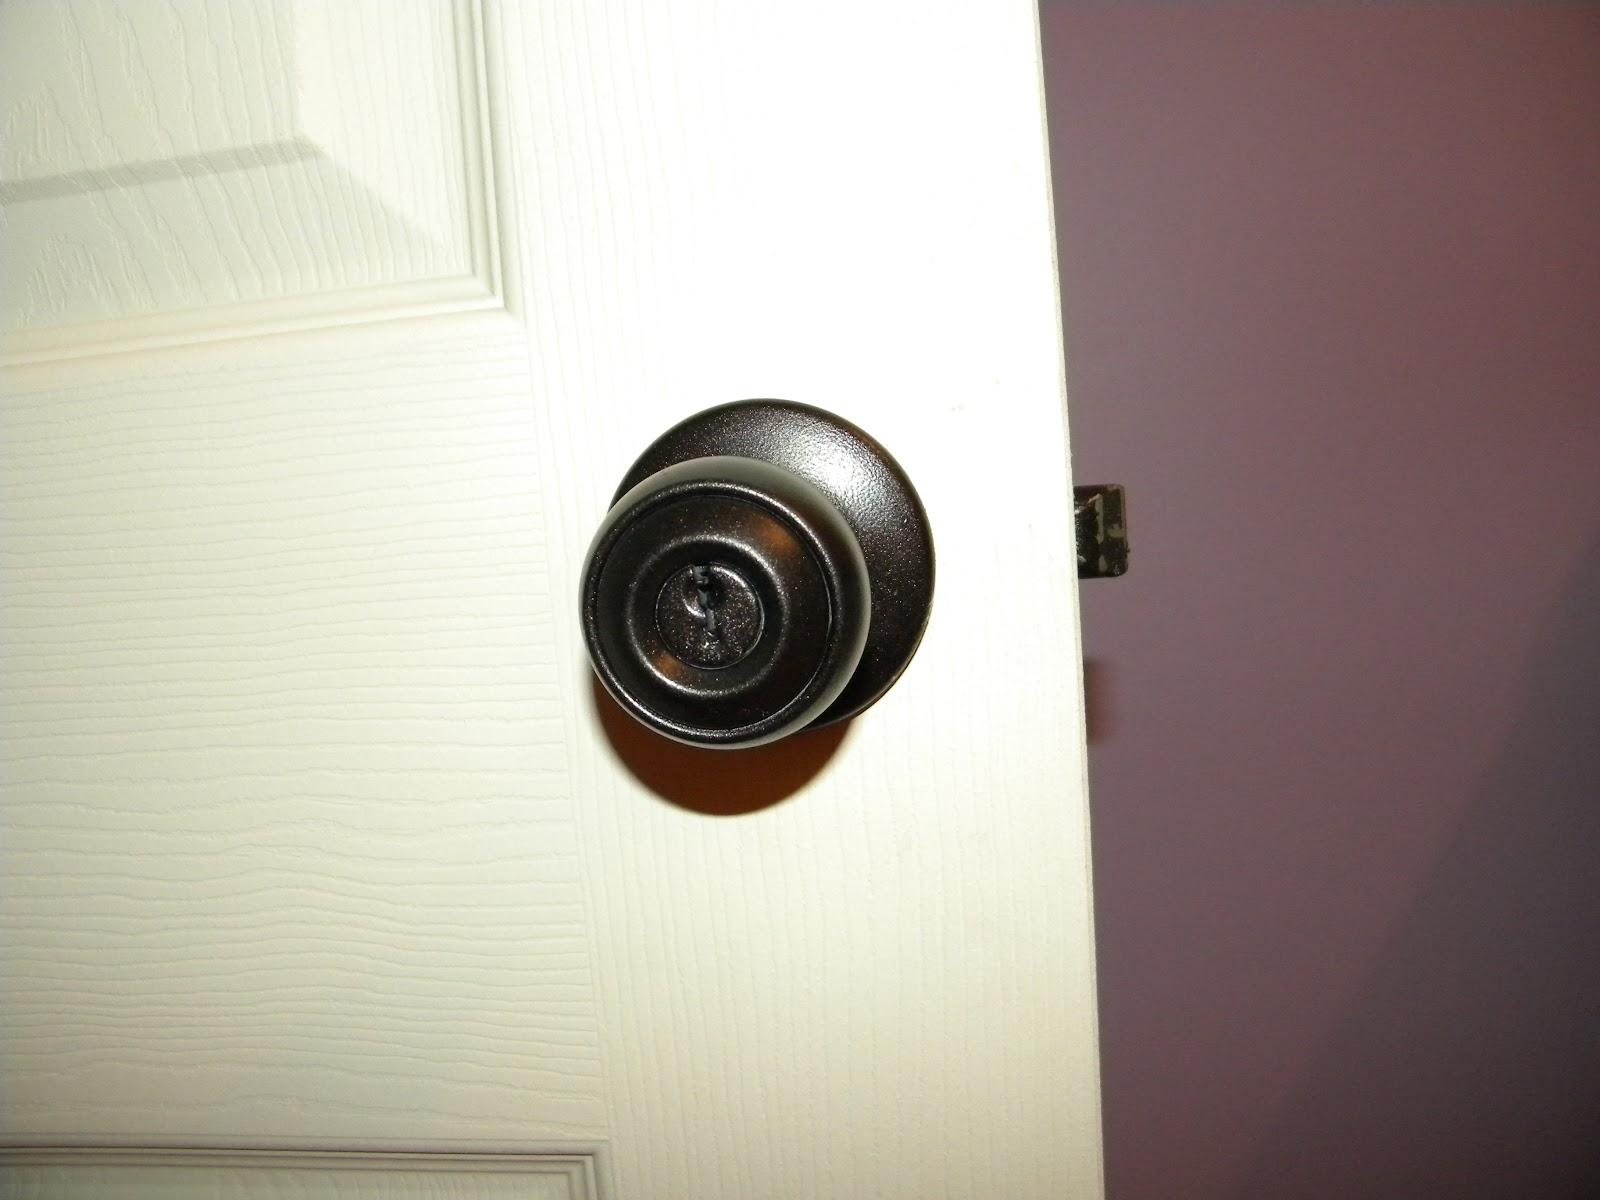 teach lake love oil rubbed bronze spray painted door knob. Black Bedroom Furniture Sets. Home Design Ideas